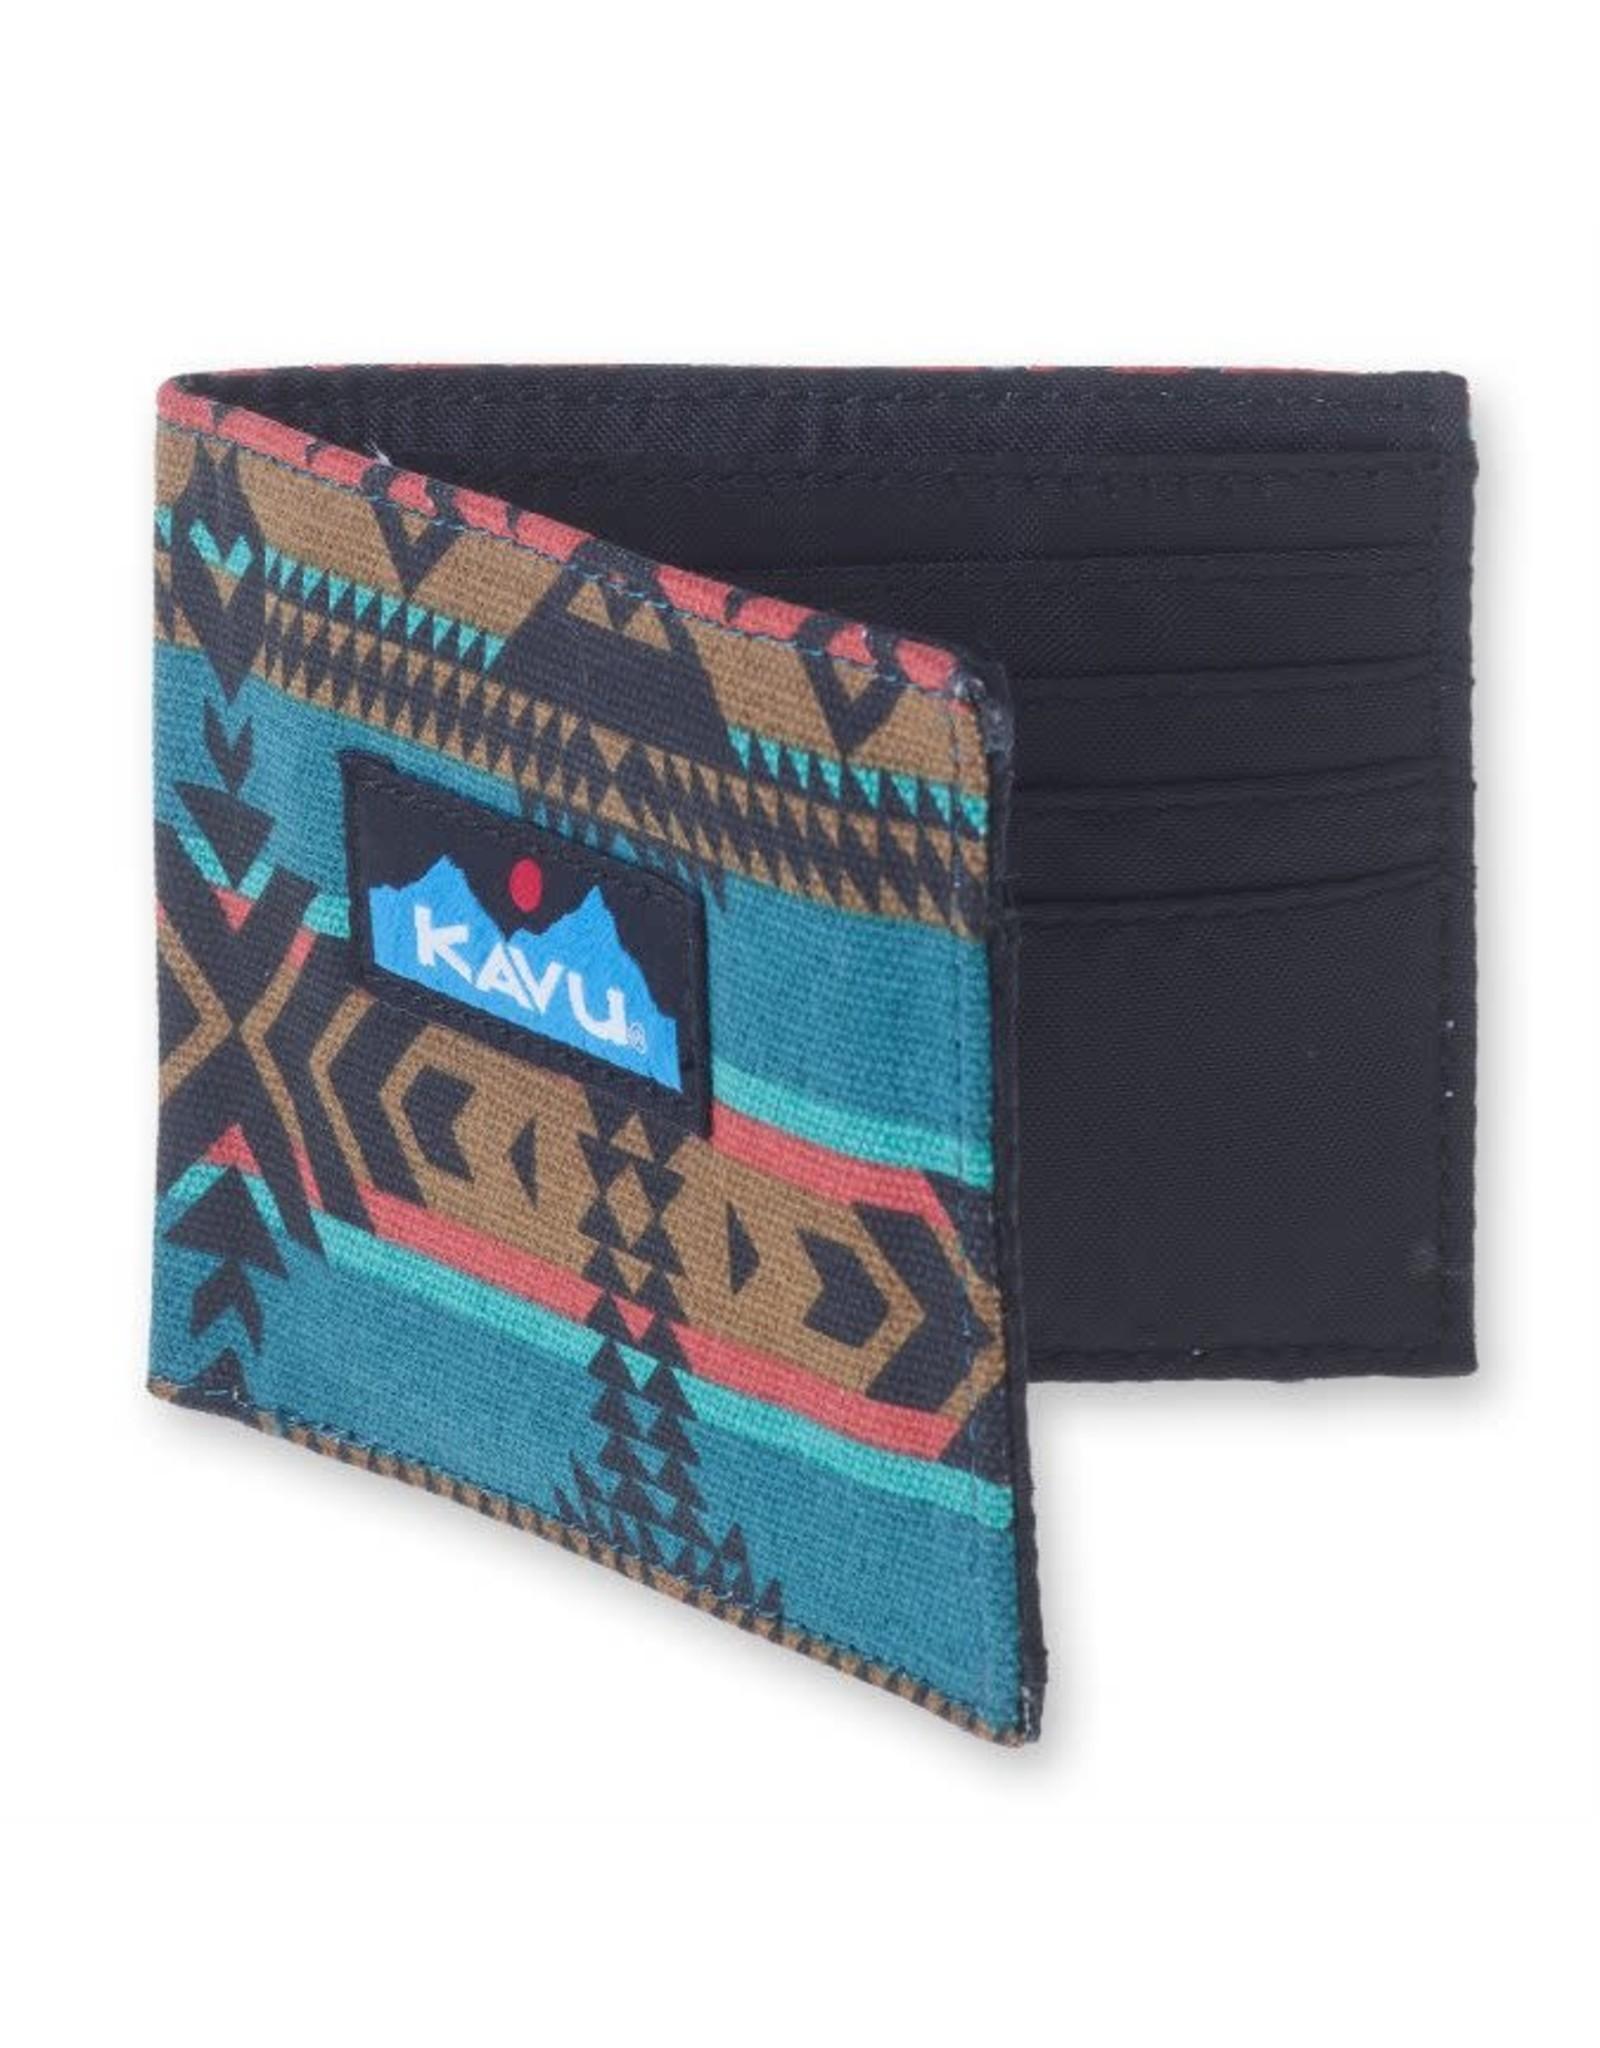 Kavu Kavu Yukon Wallet: Pacific Blanket